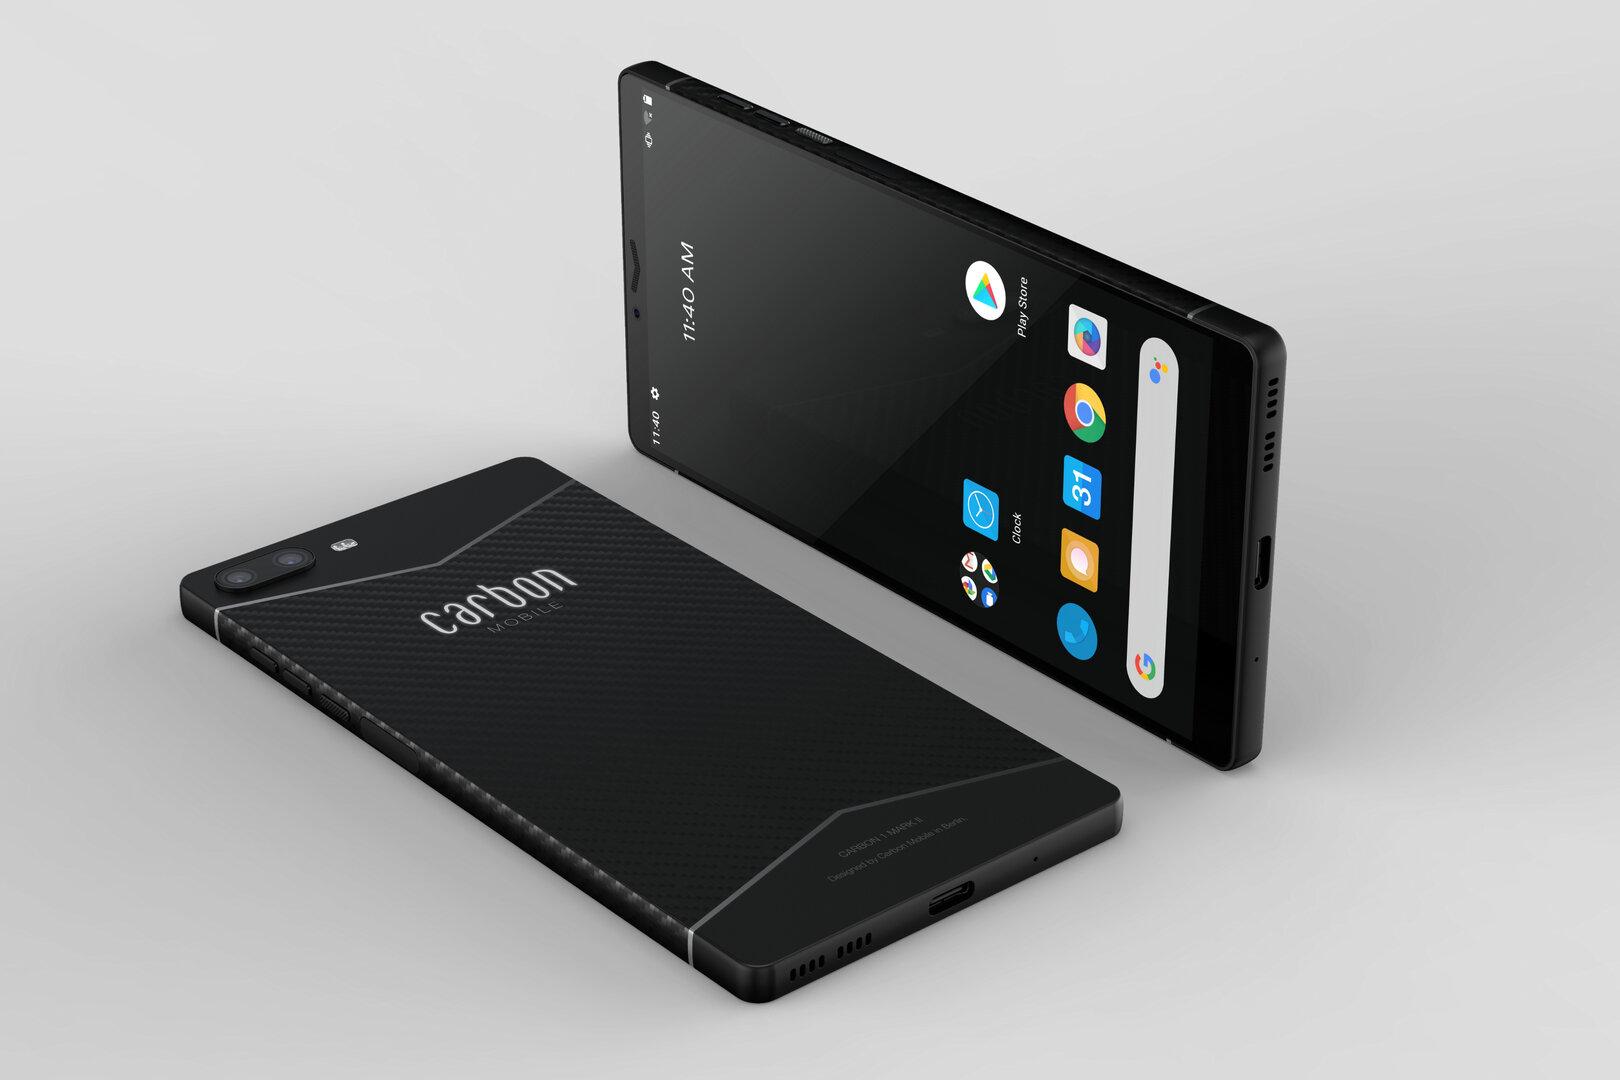 Carbon 1 MK II : voici le smartphone allemand conçu en fibre de carbone - Frandroid